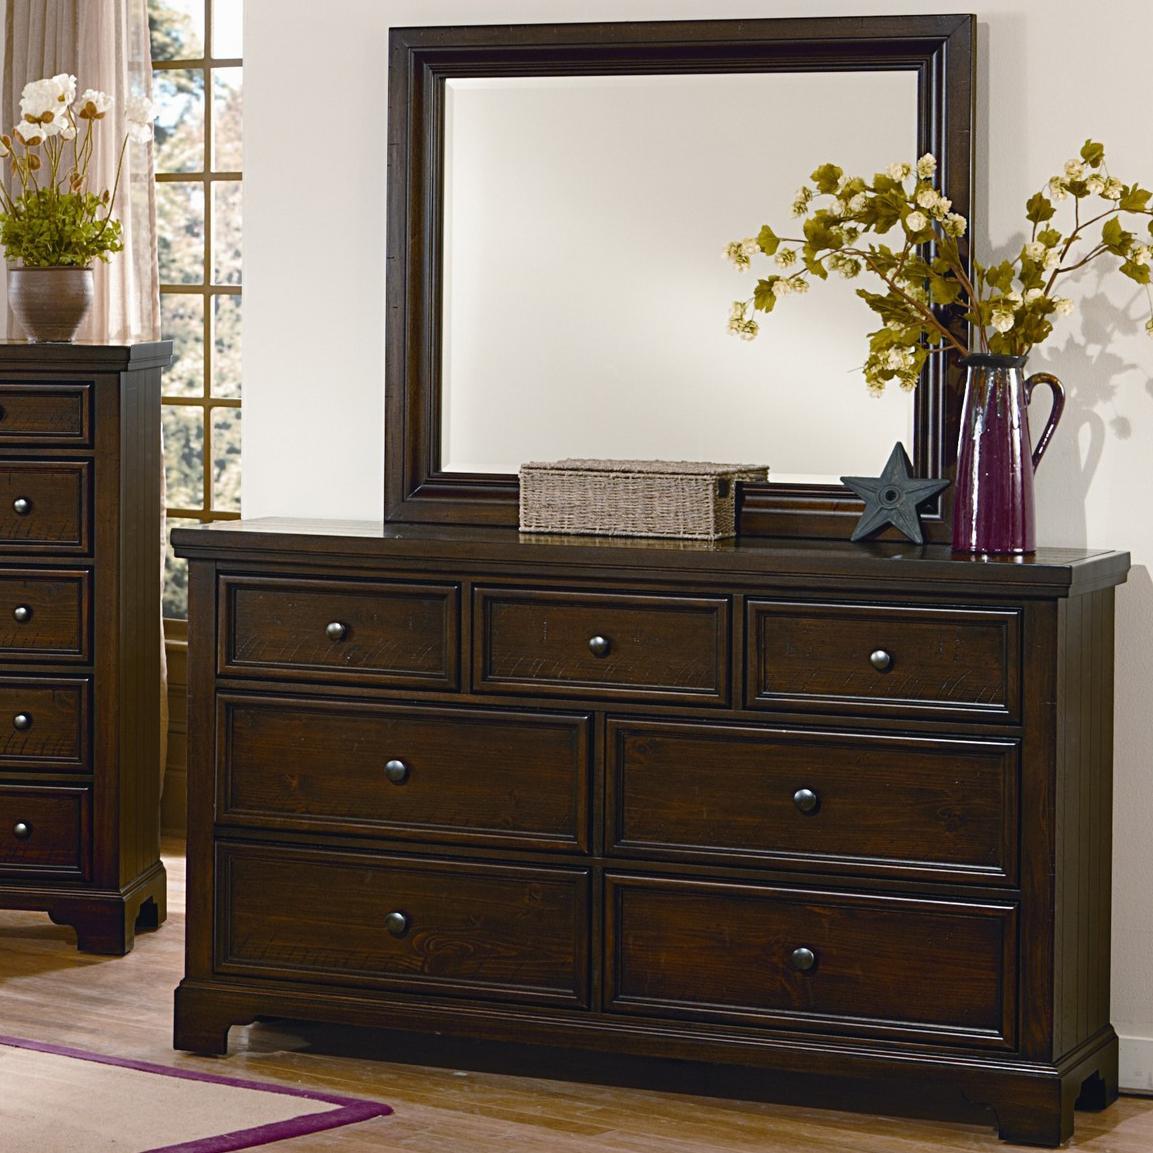 Vaughan Bassett Hanover Dresser & Mirror Set - Item Number: 810-002+466